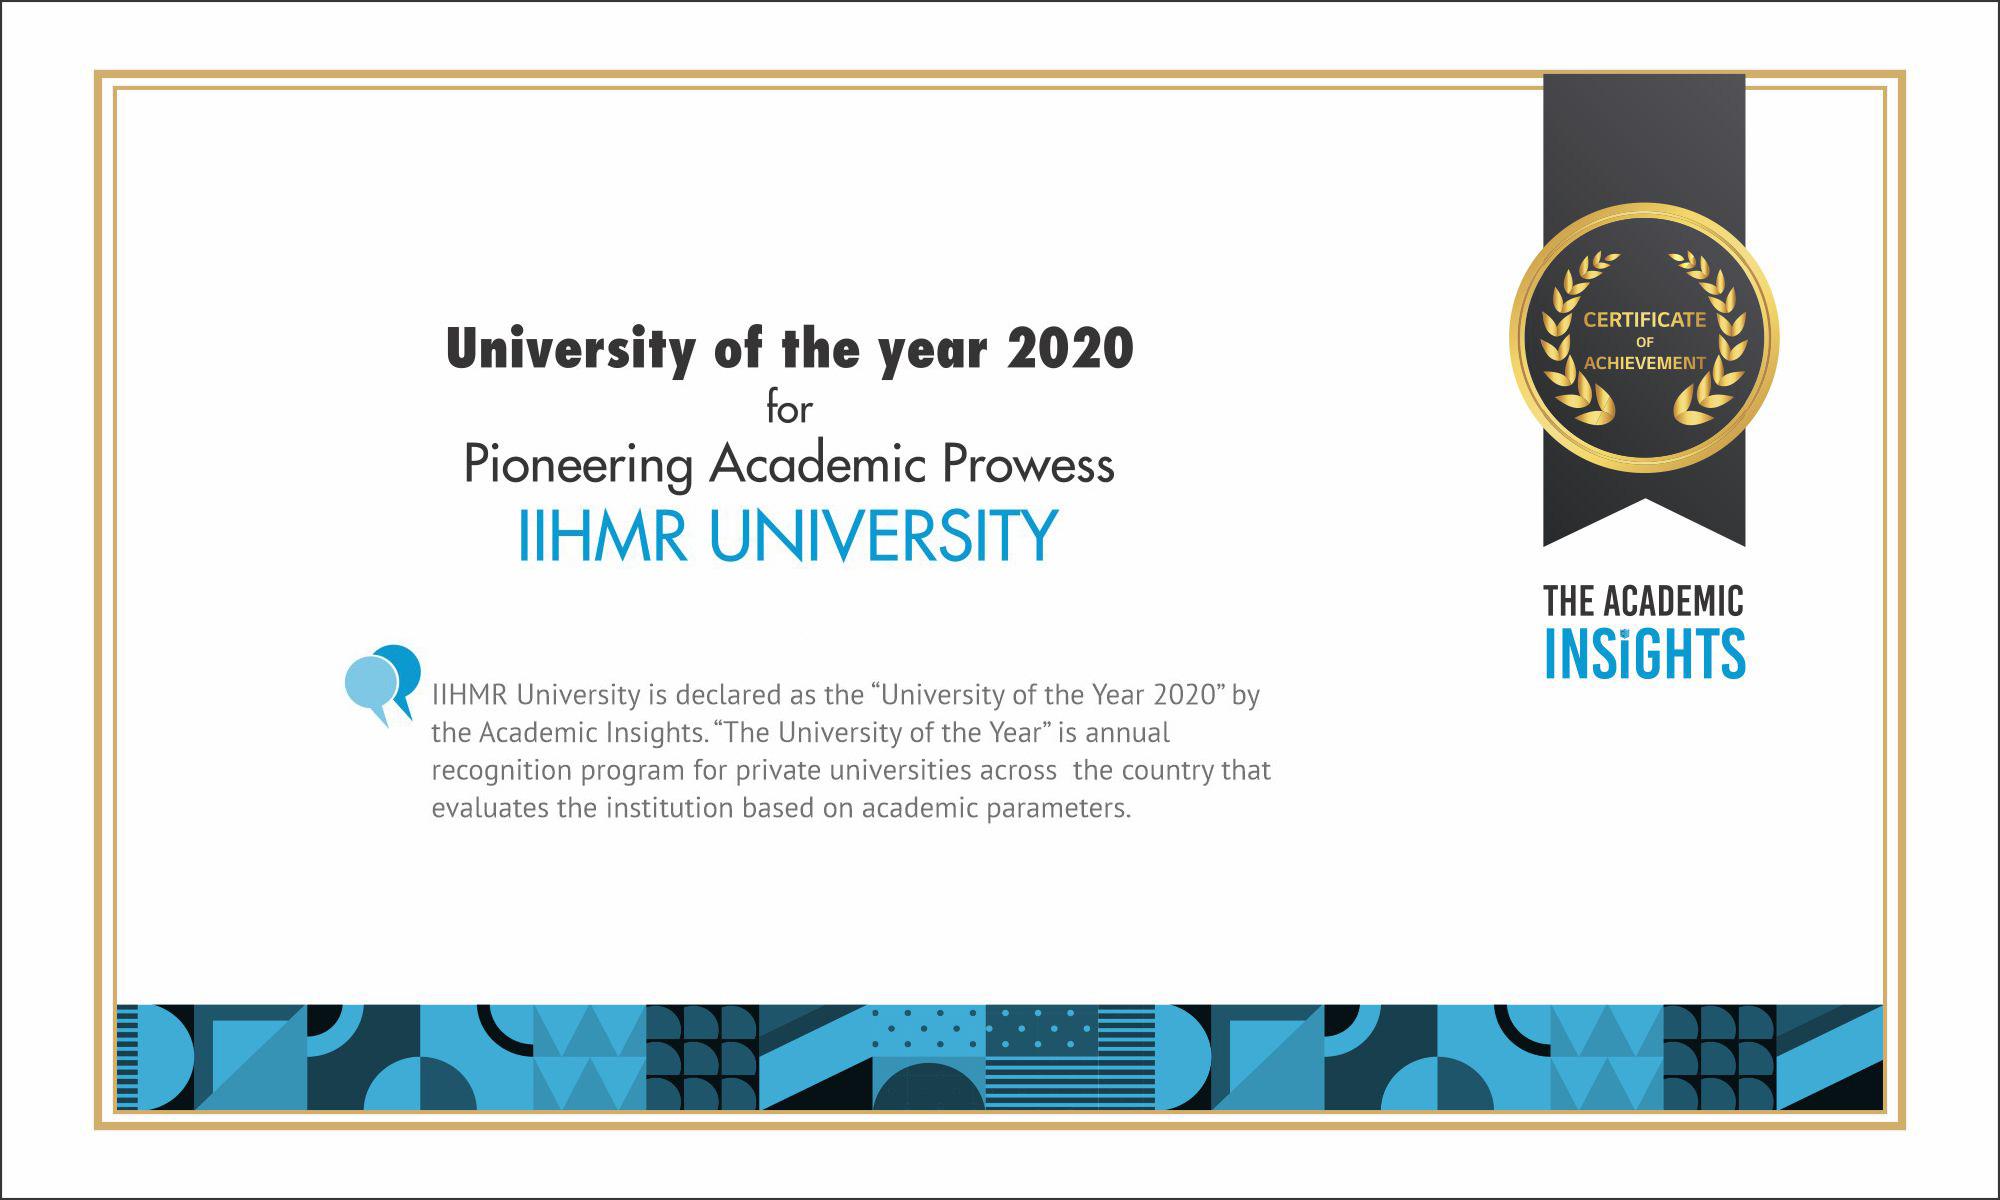 University of the year 2020, IIHMR University